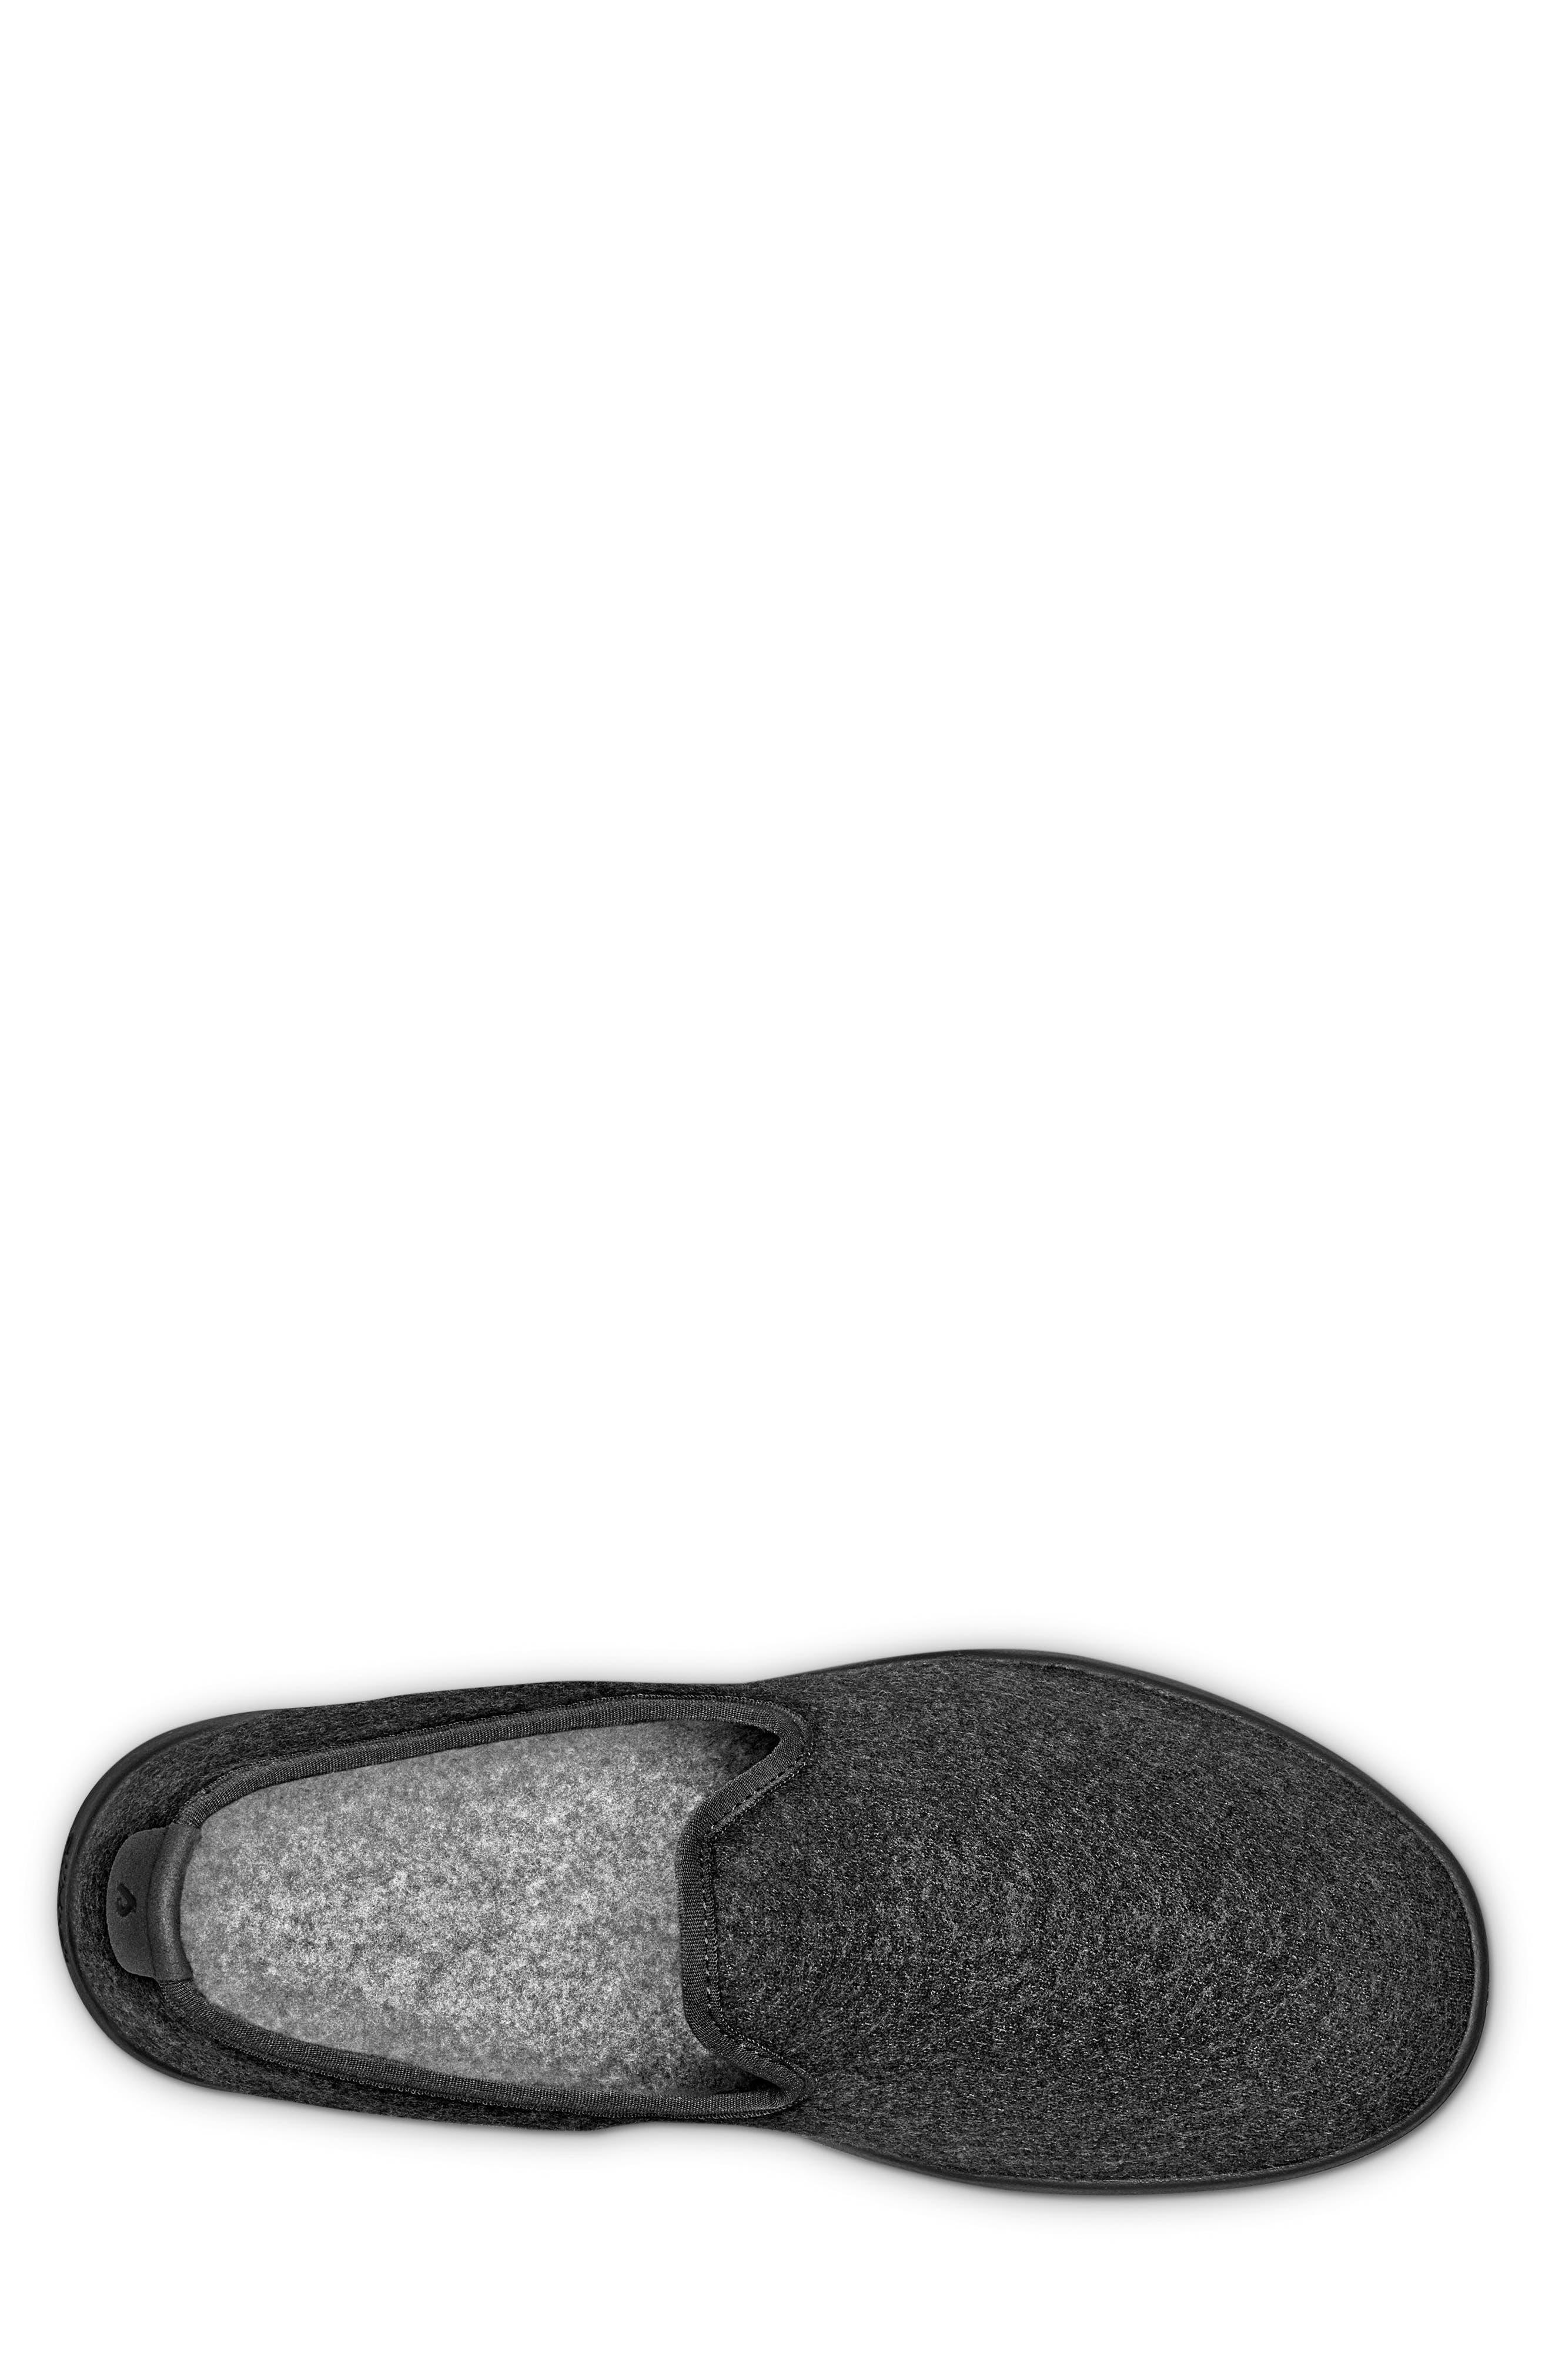 Wool Lounger,                             Alternate thumbnail 4, color,                             Natural Black